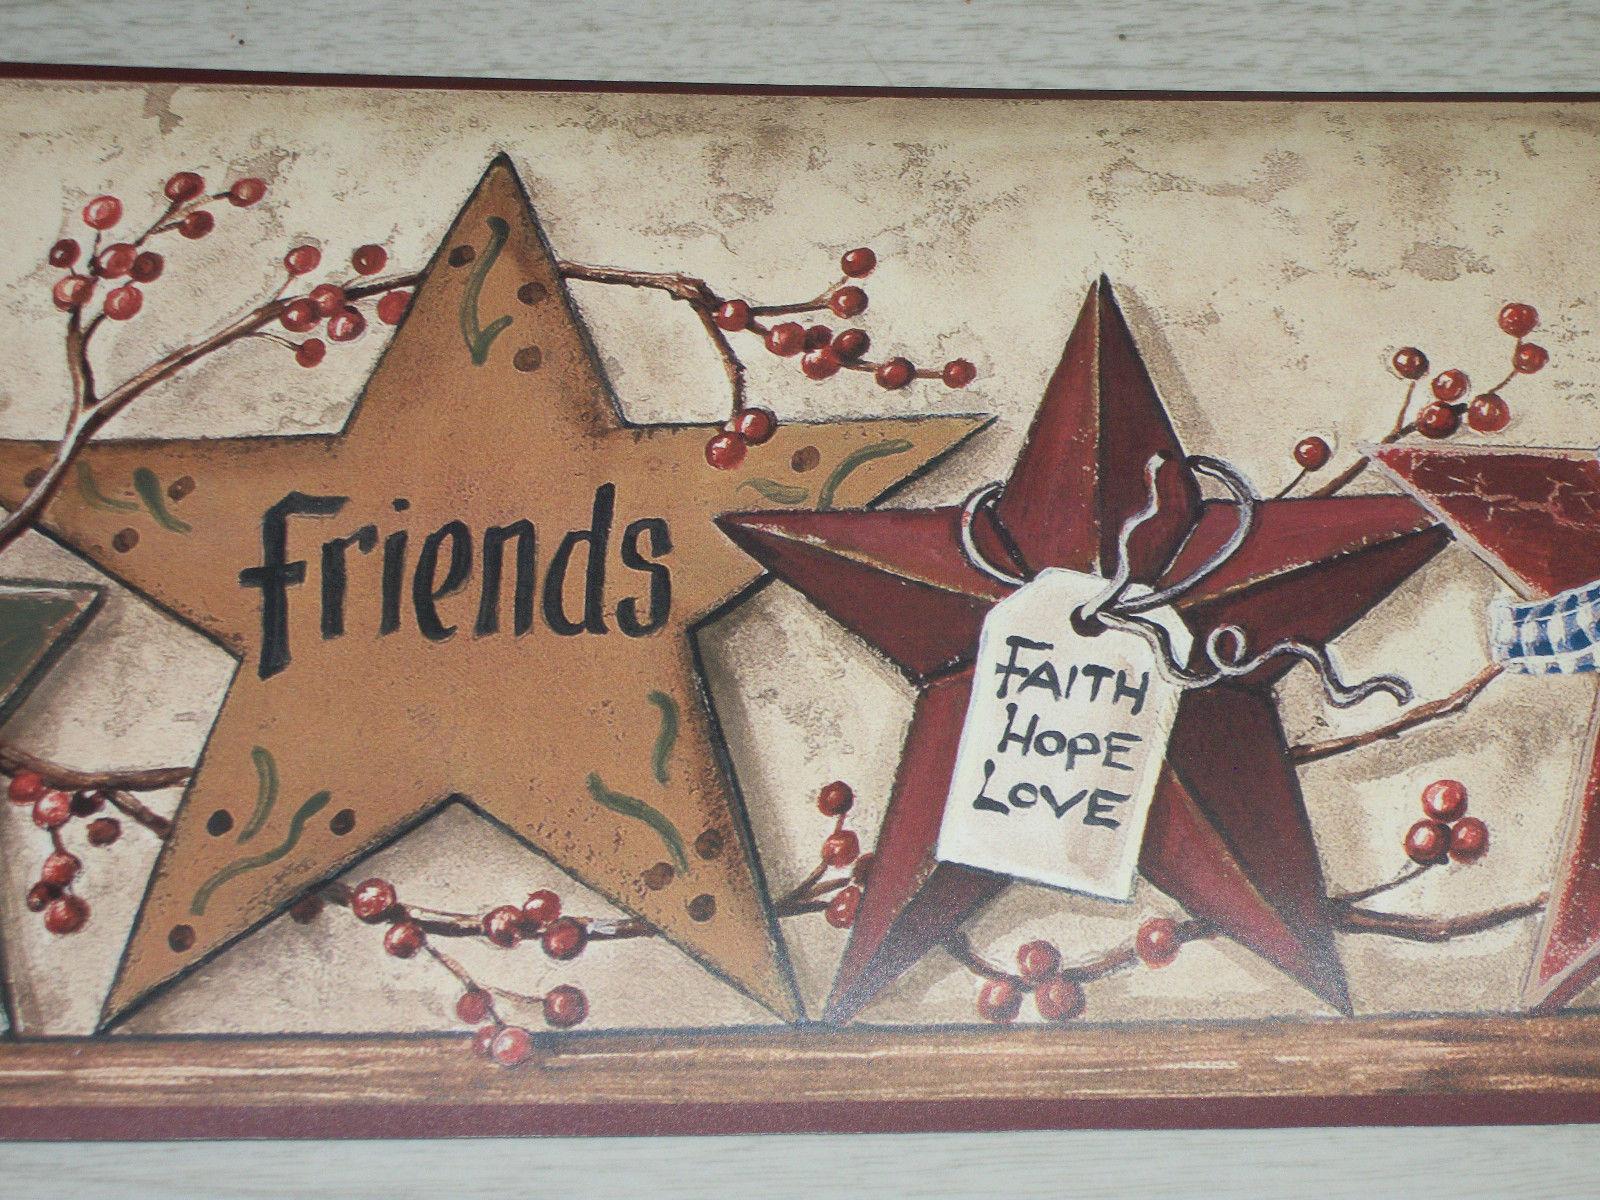 YORK FAITH HOPE LOVE FAMILY FRIENDS COUNTRY STARS BERRIES WALLPAPER 1600x1200